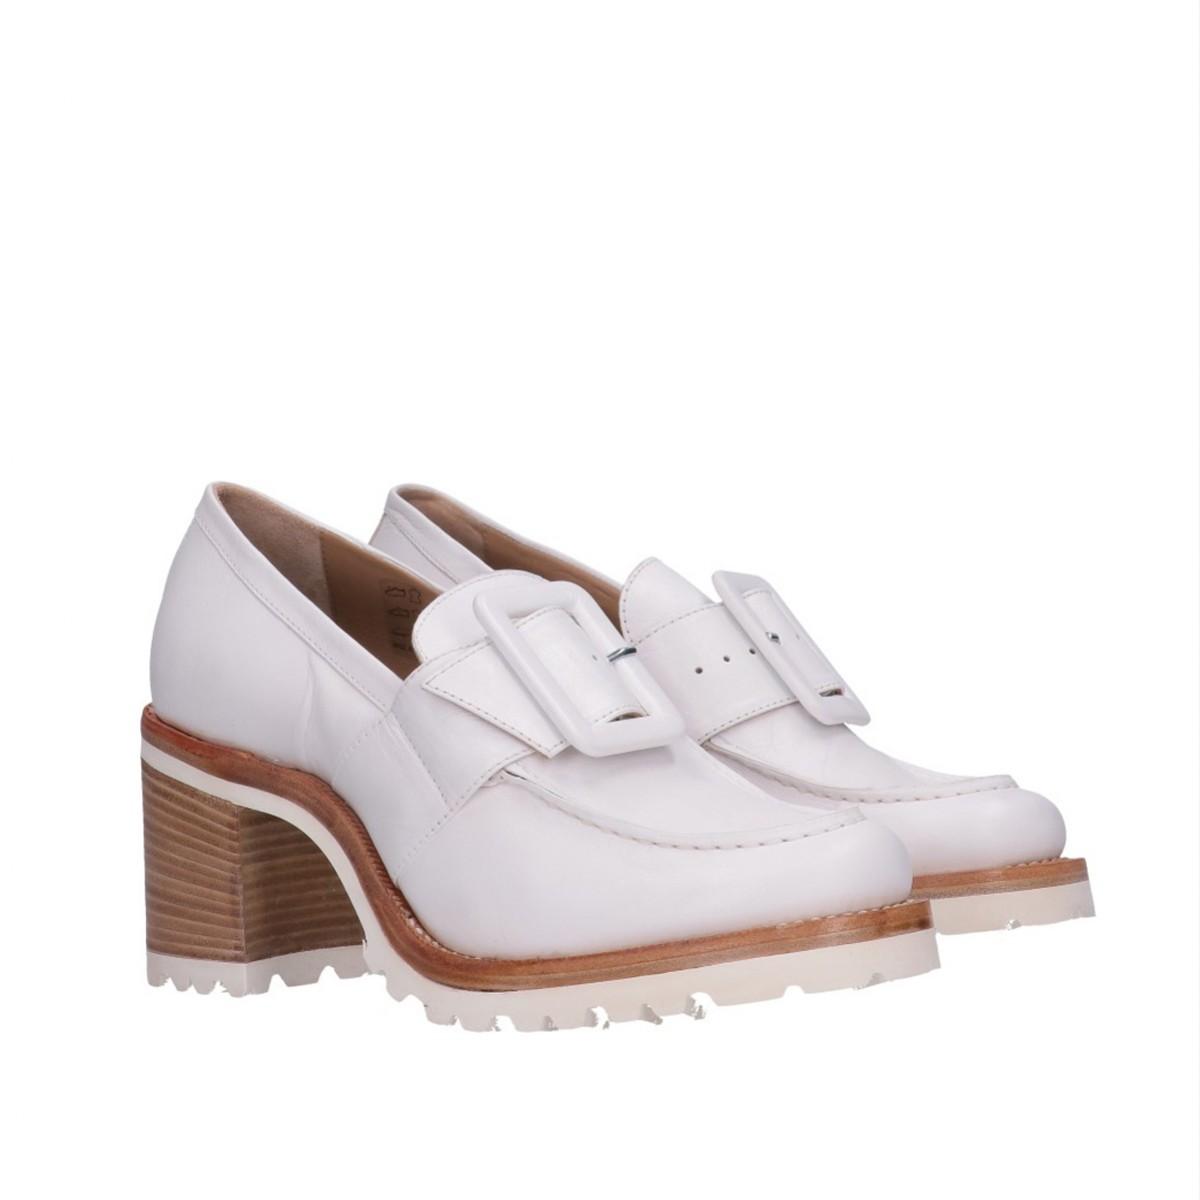 Buckle Loafer High Heel